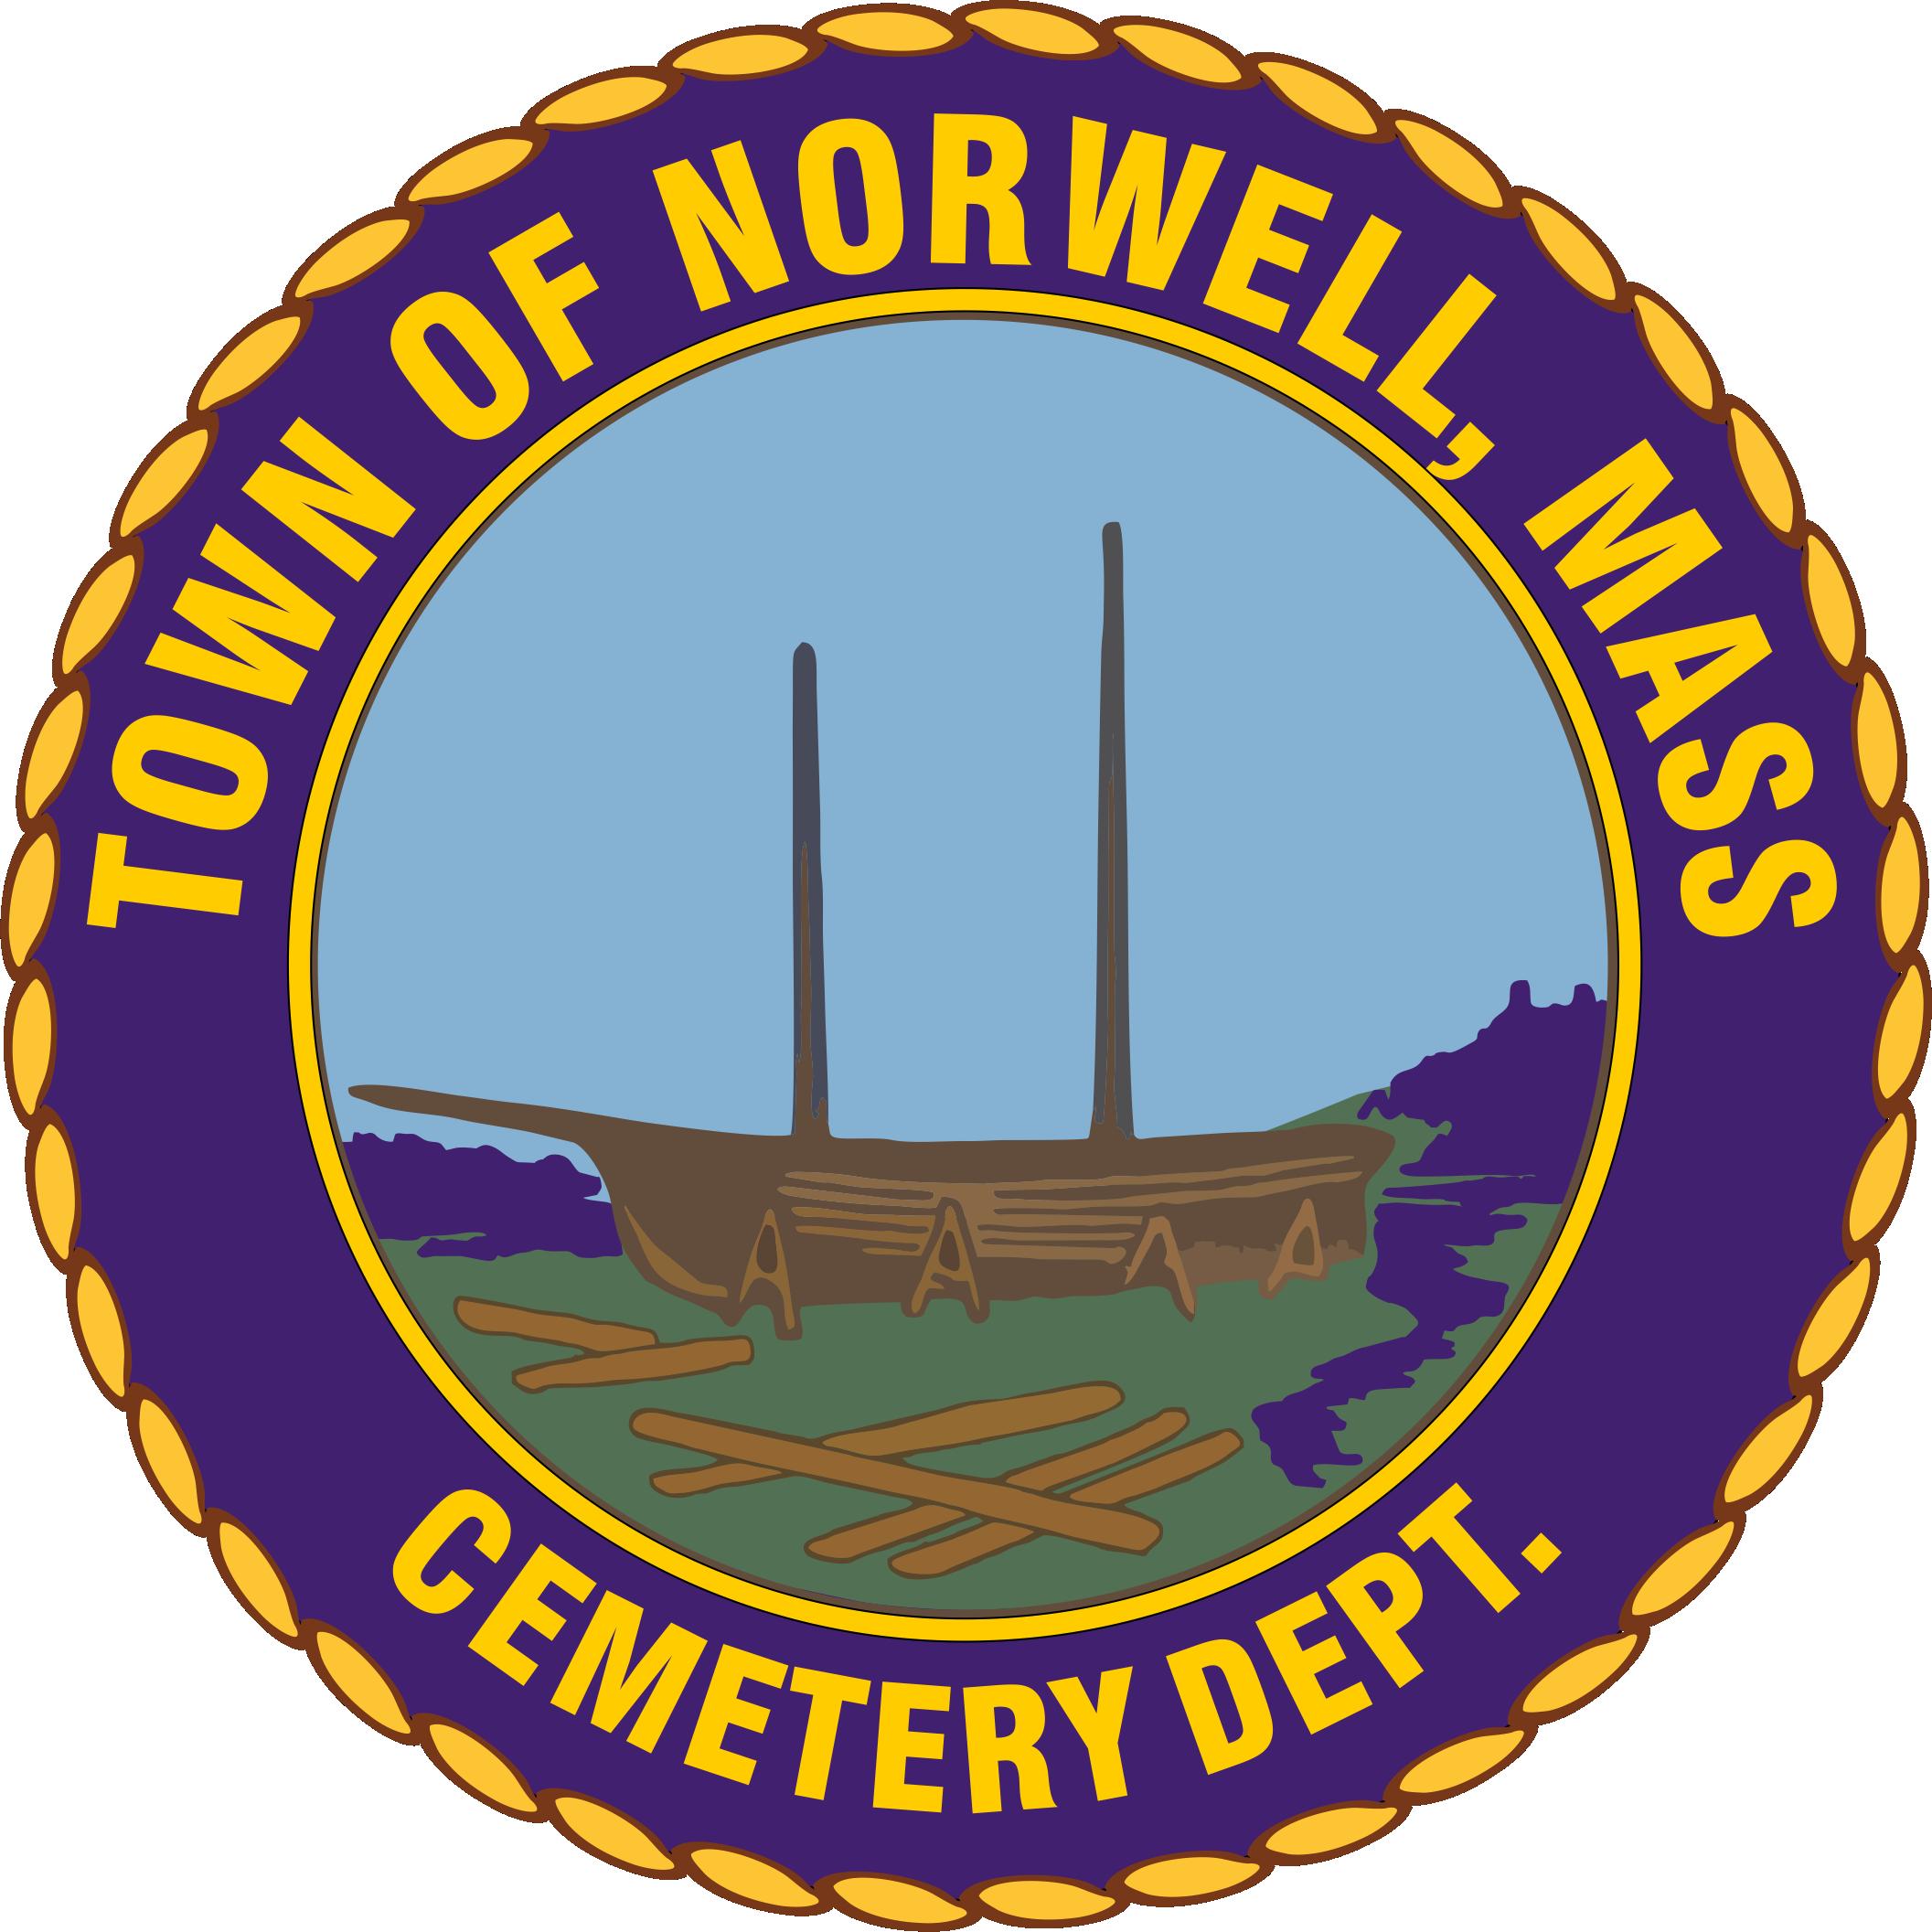 Damon cemeteries town of. Clipart church graveyard